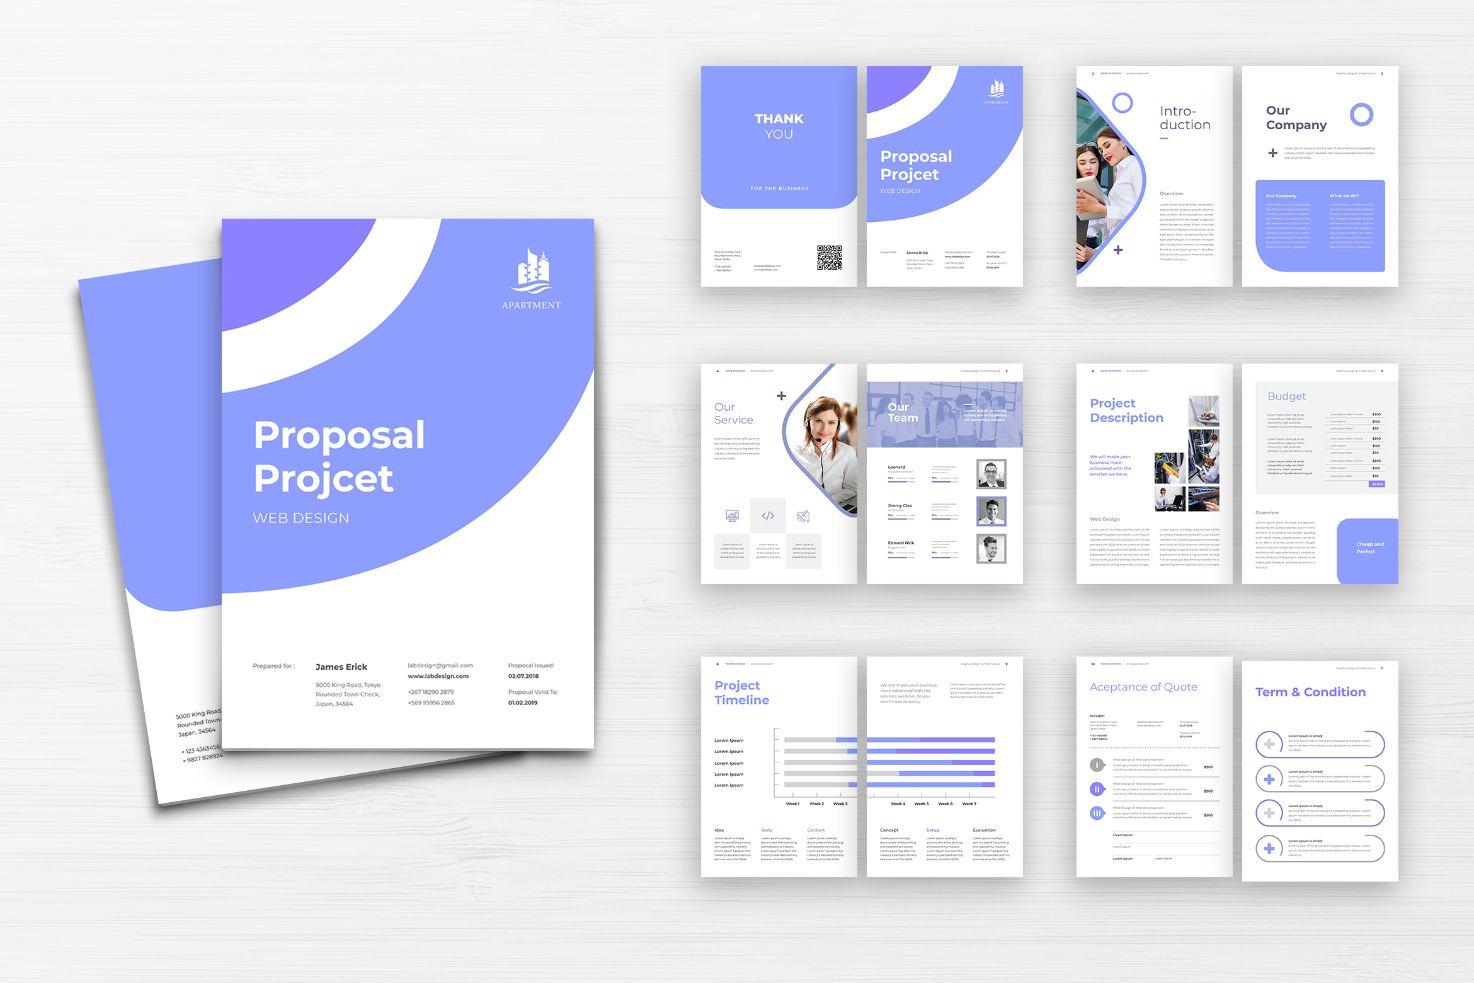 Proposal Web Design Project Corporate Identity Template